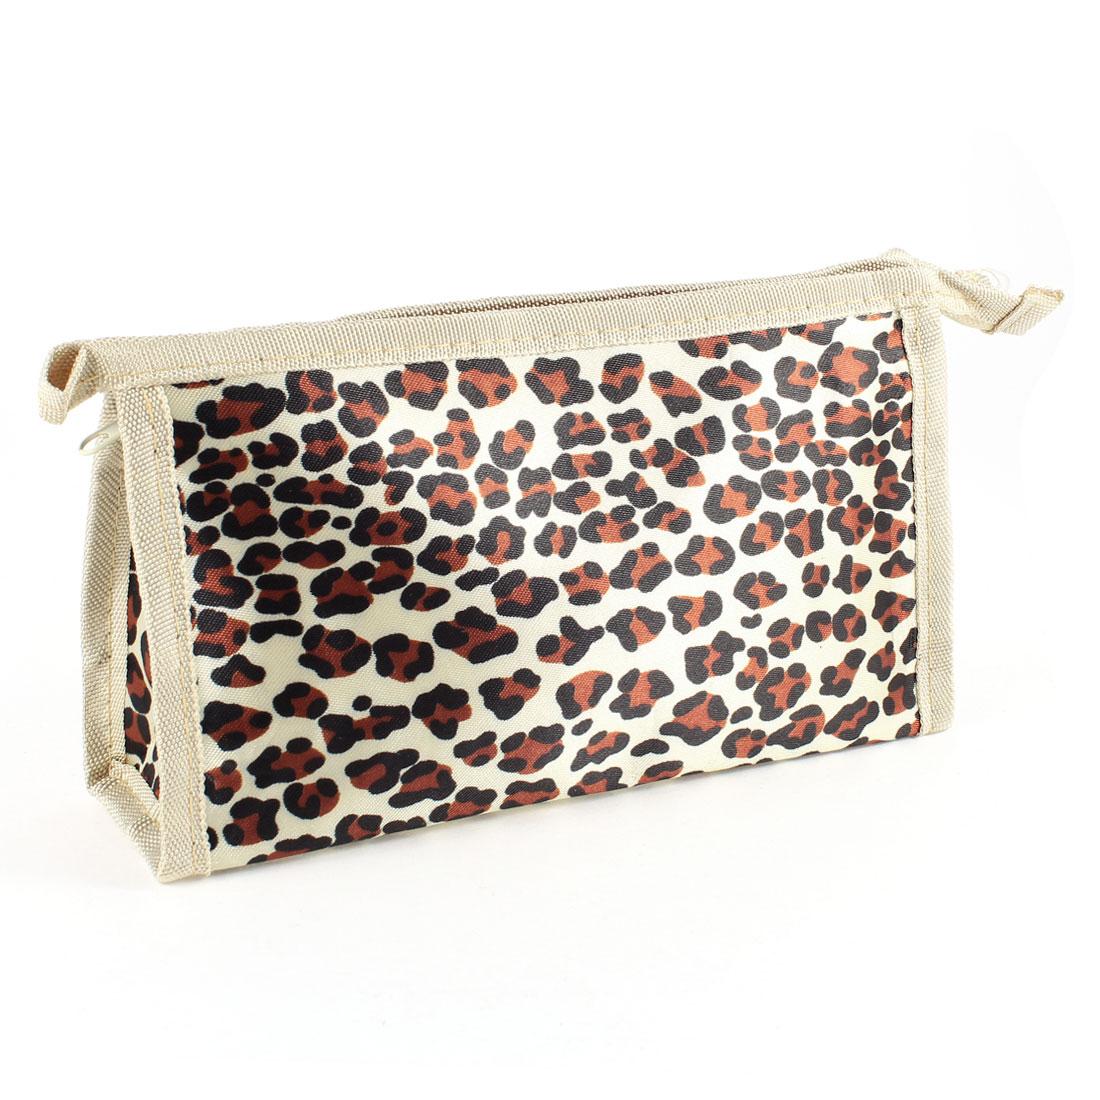 Women Beige Nylon Leopard Prints Zippered Cosmetic Pouch Bag Holder